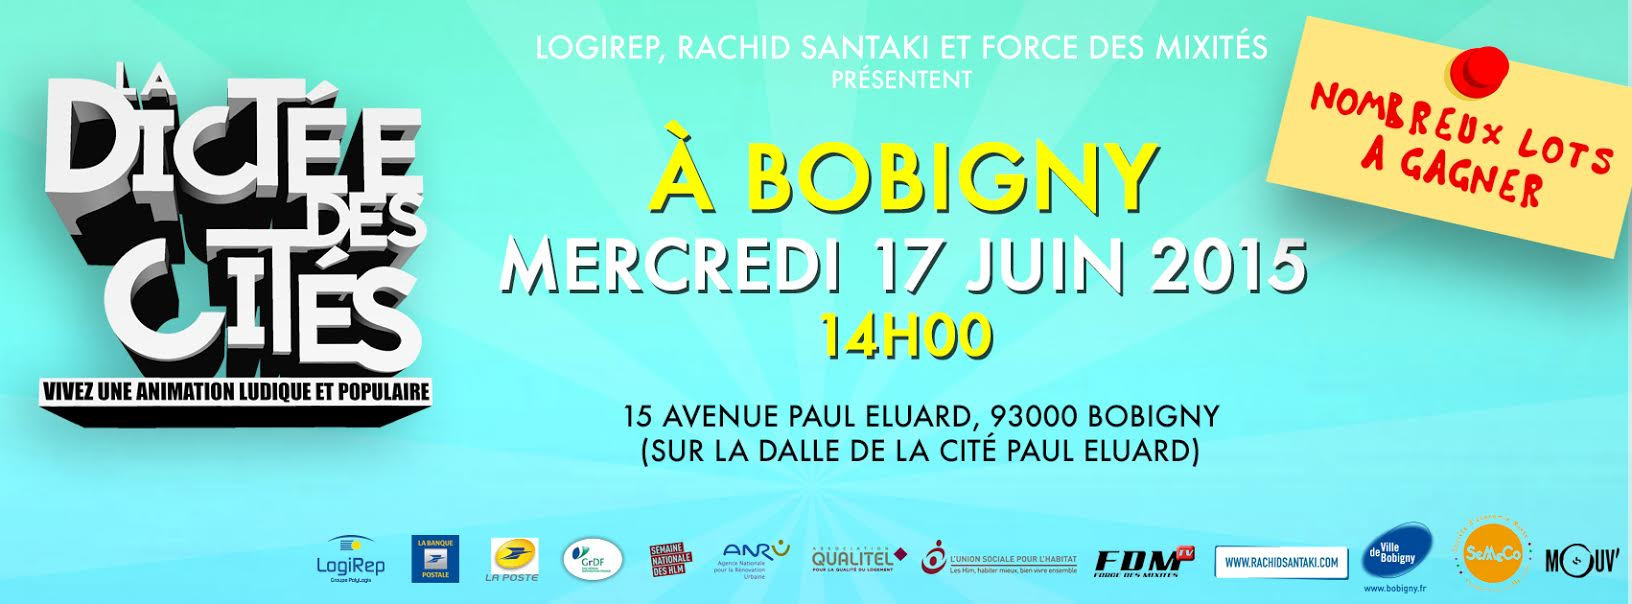 COVER Dictée des Cités Bobigny